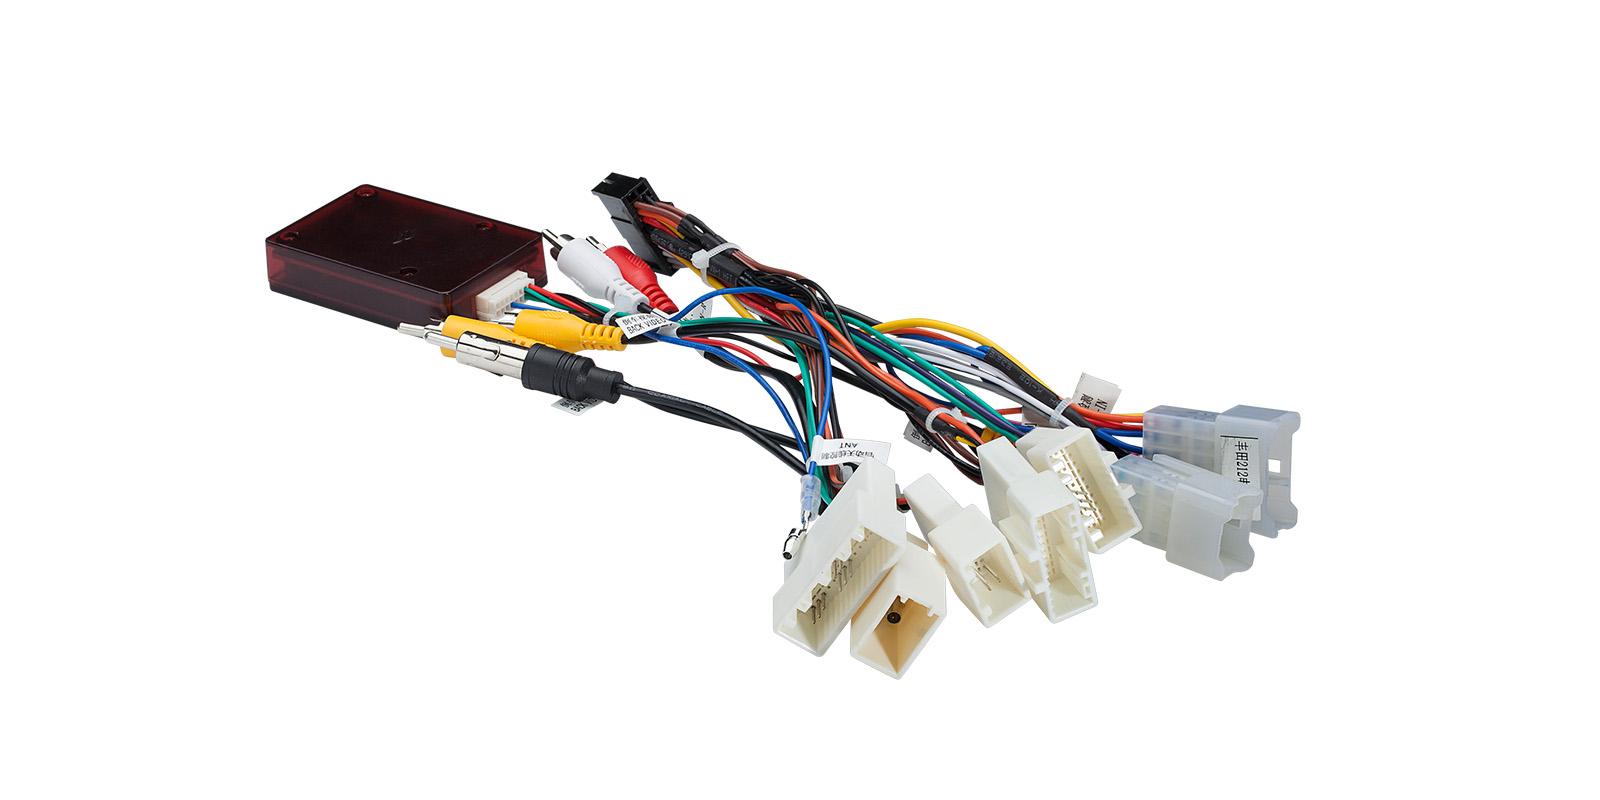 xtrons pf81mtv wiring diagram viper winch best car iso harness adapters jbl decoder